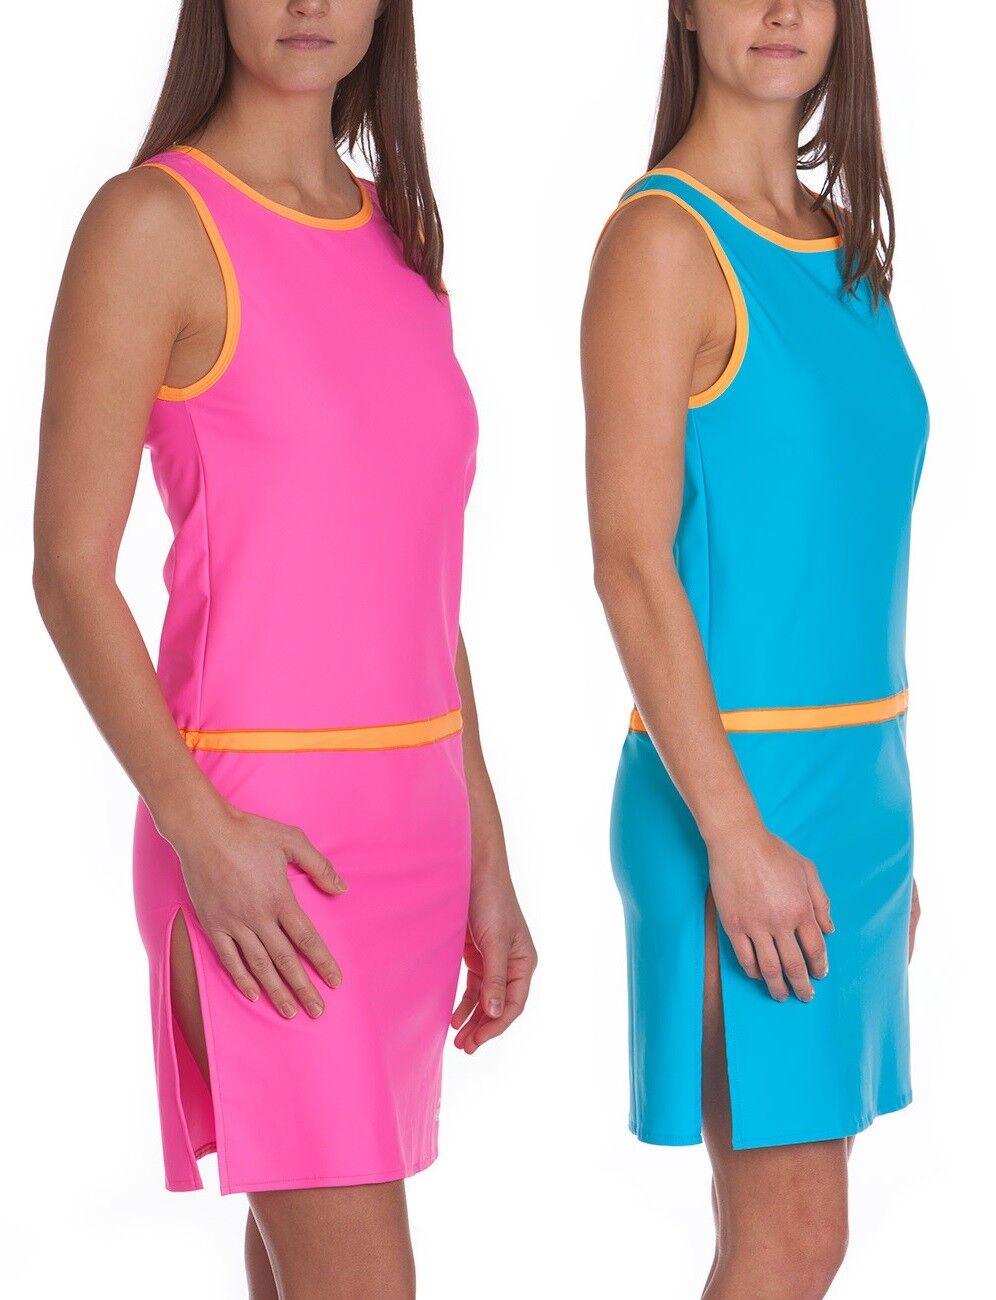 IQ UV 300 TUNIKA DaMänner Sommerkleid UV Schutz UV Kleid für DaMänner (655122) NEU